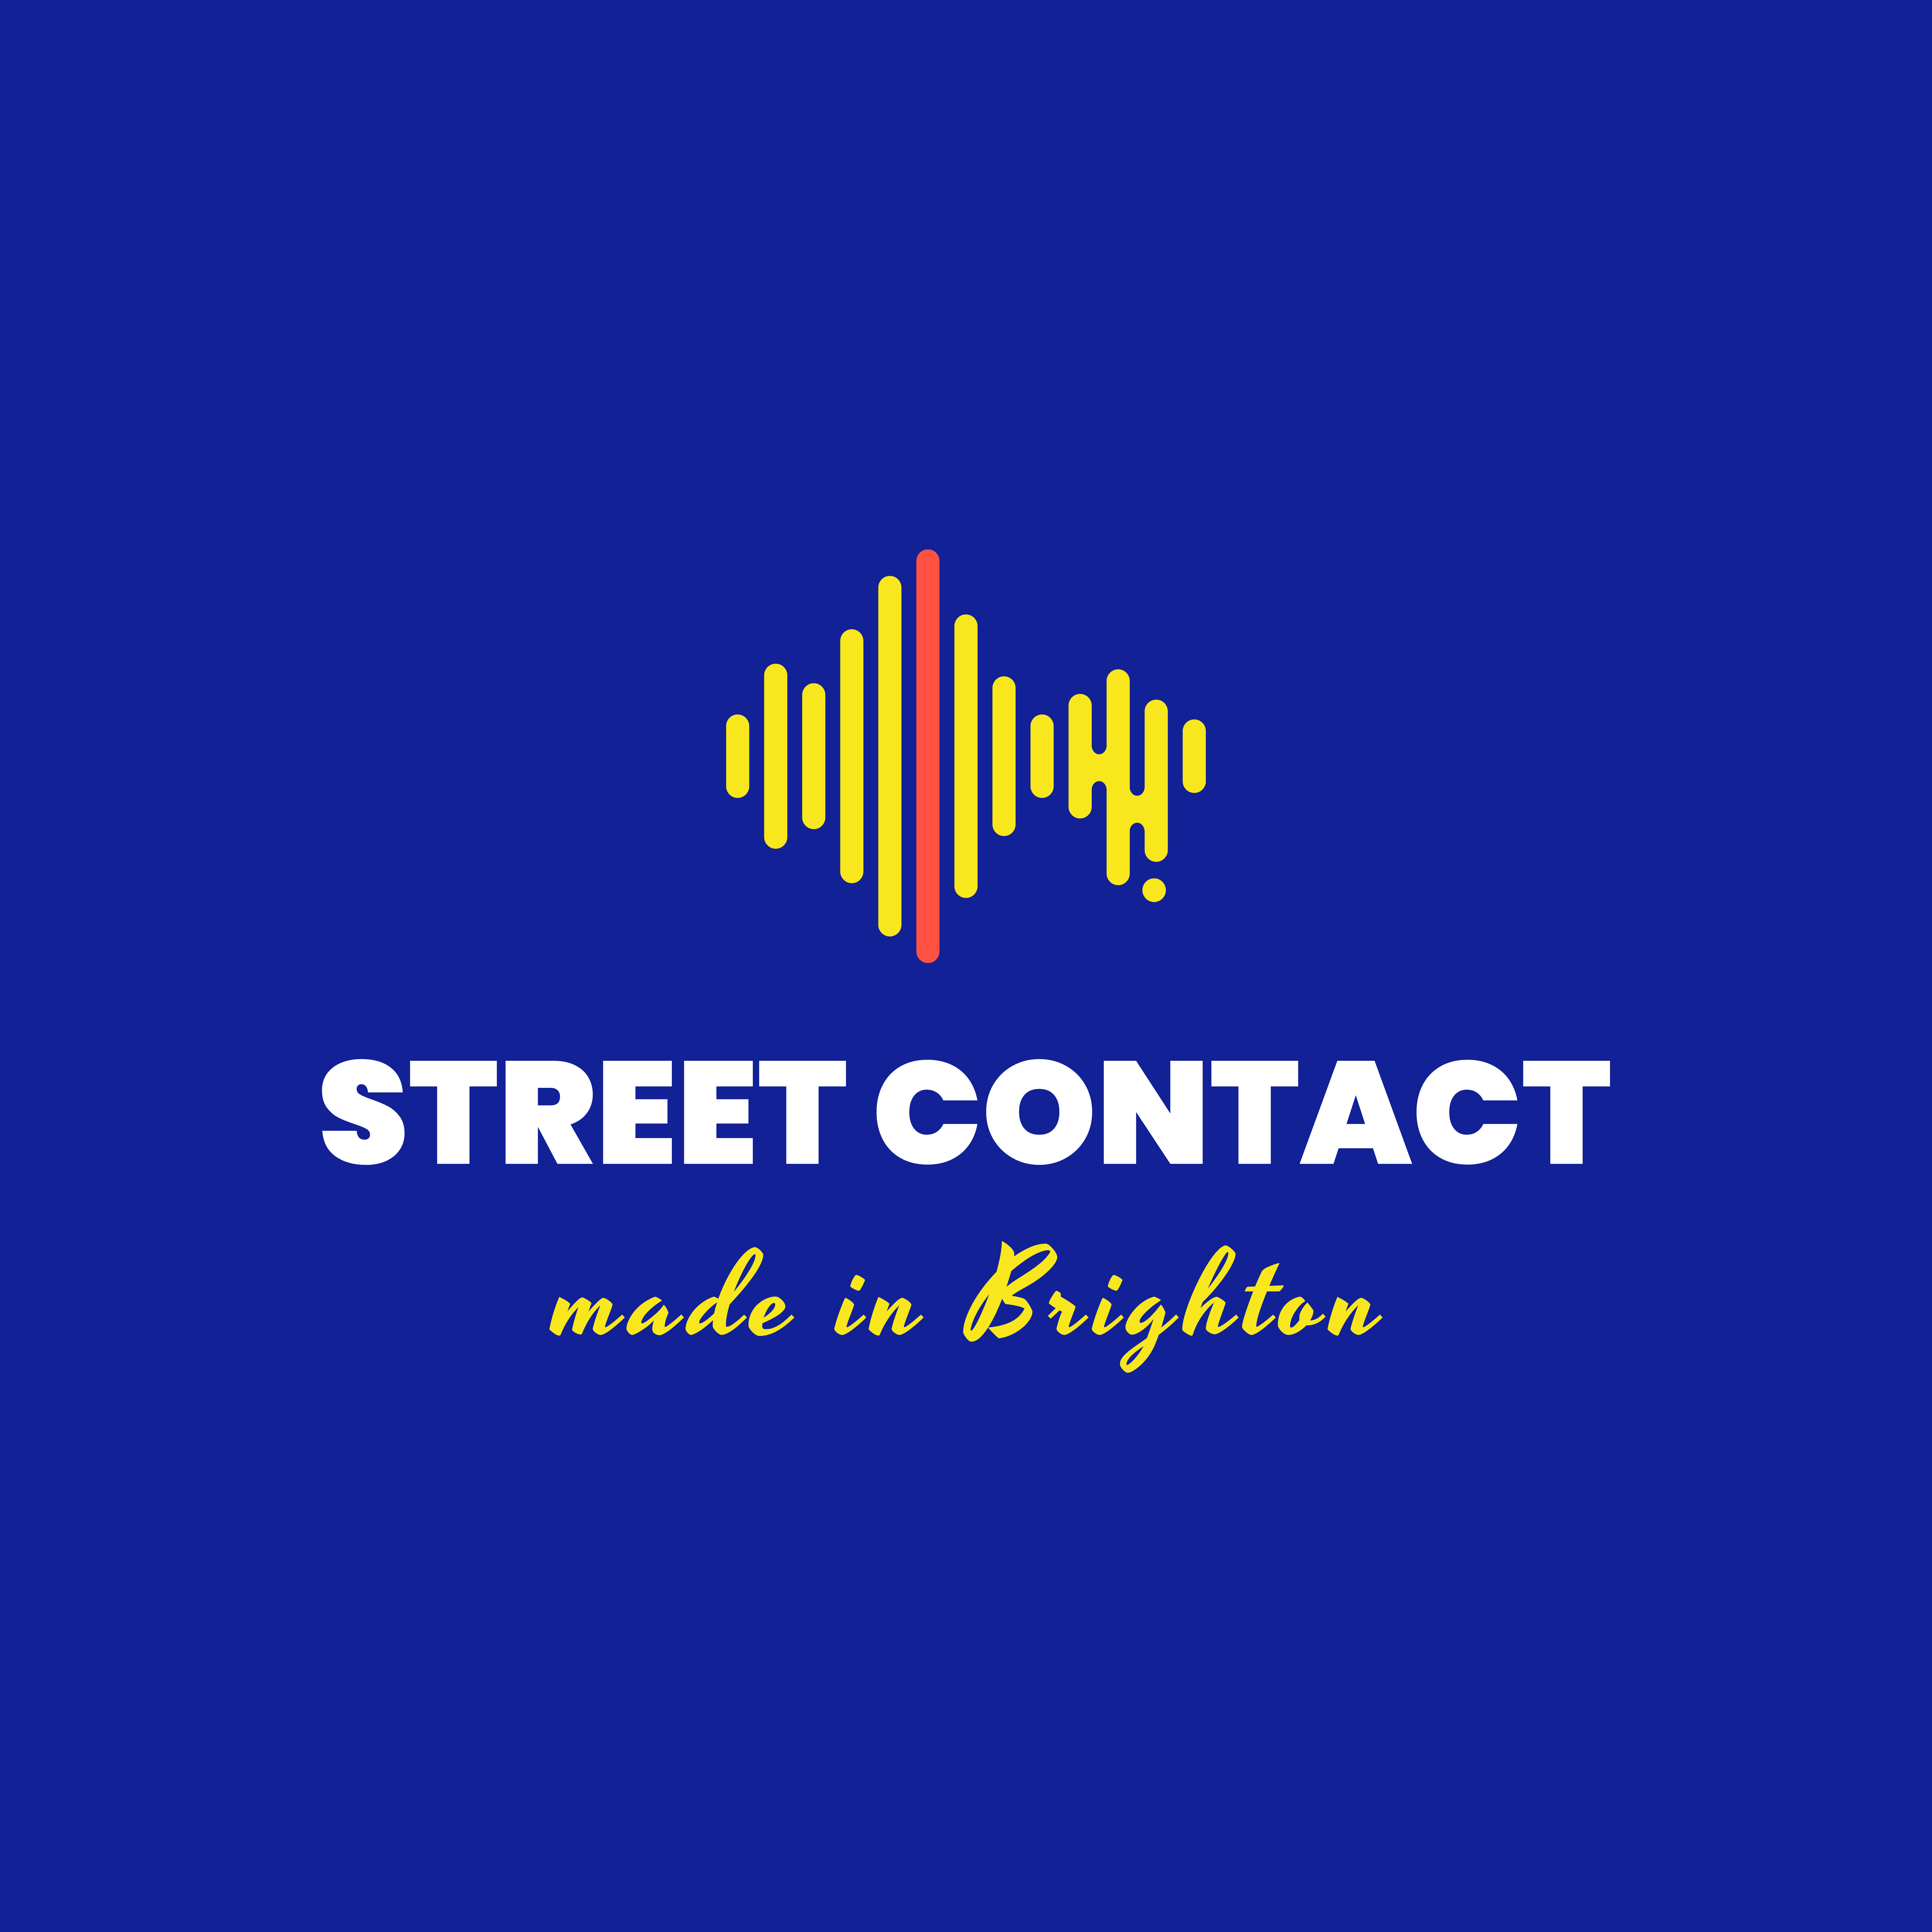 Street Contact Brighton